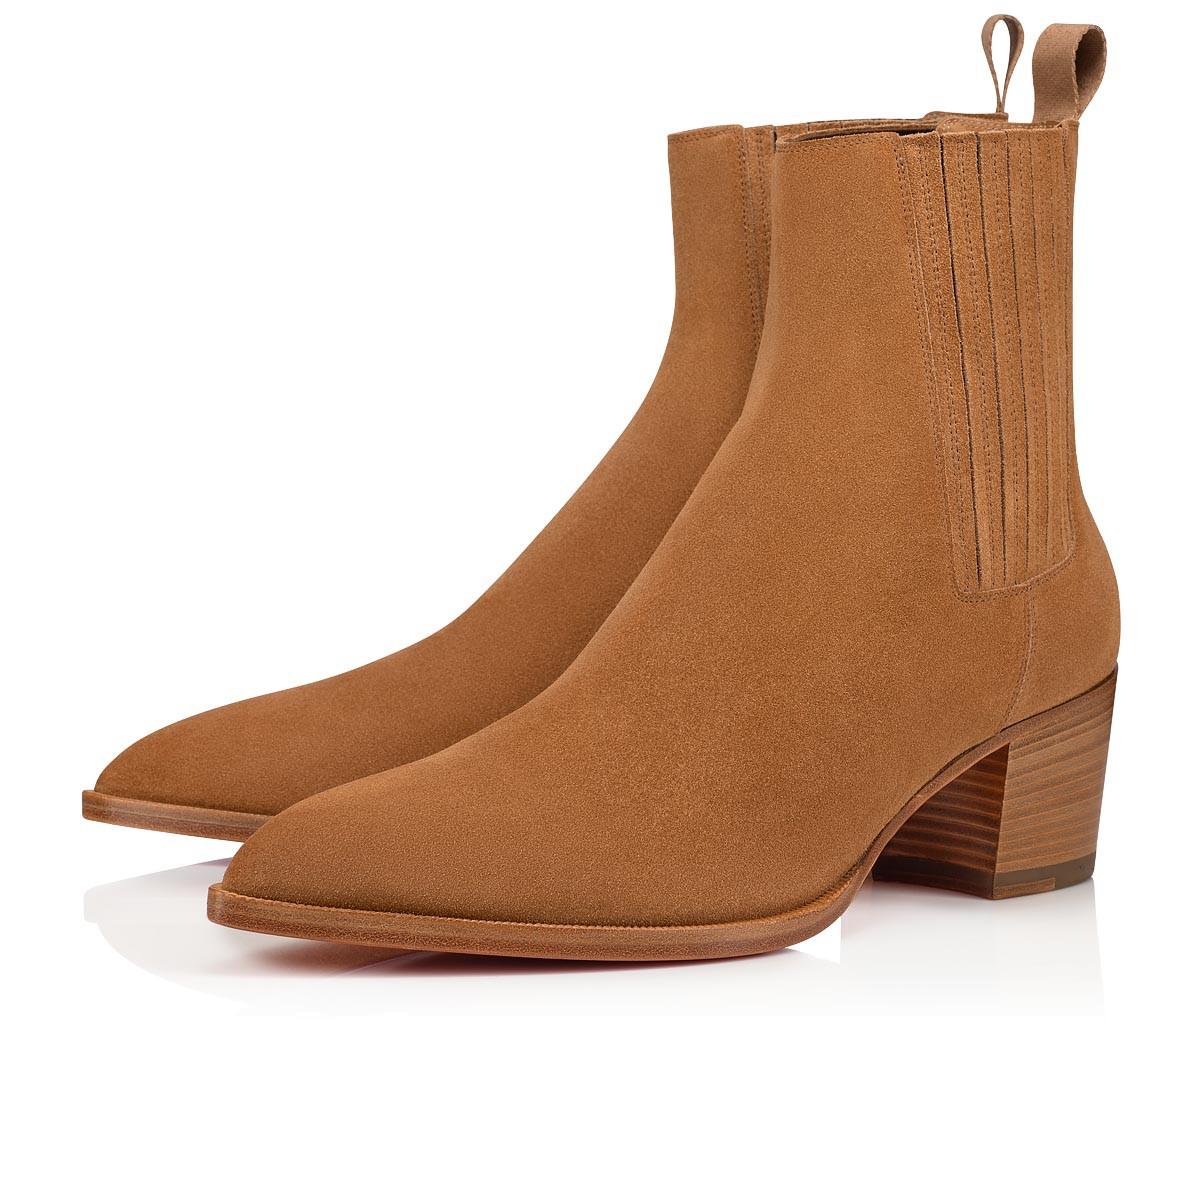 Shoes - William Flat - Christian Louboutin